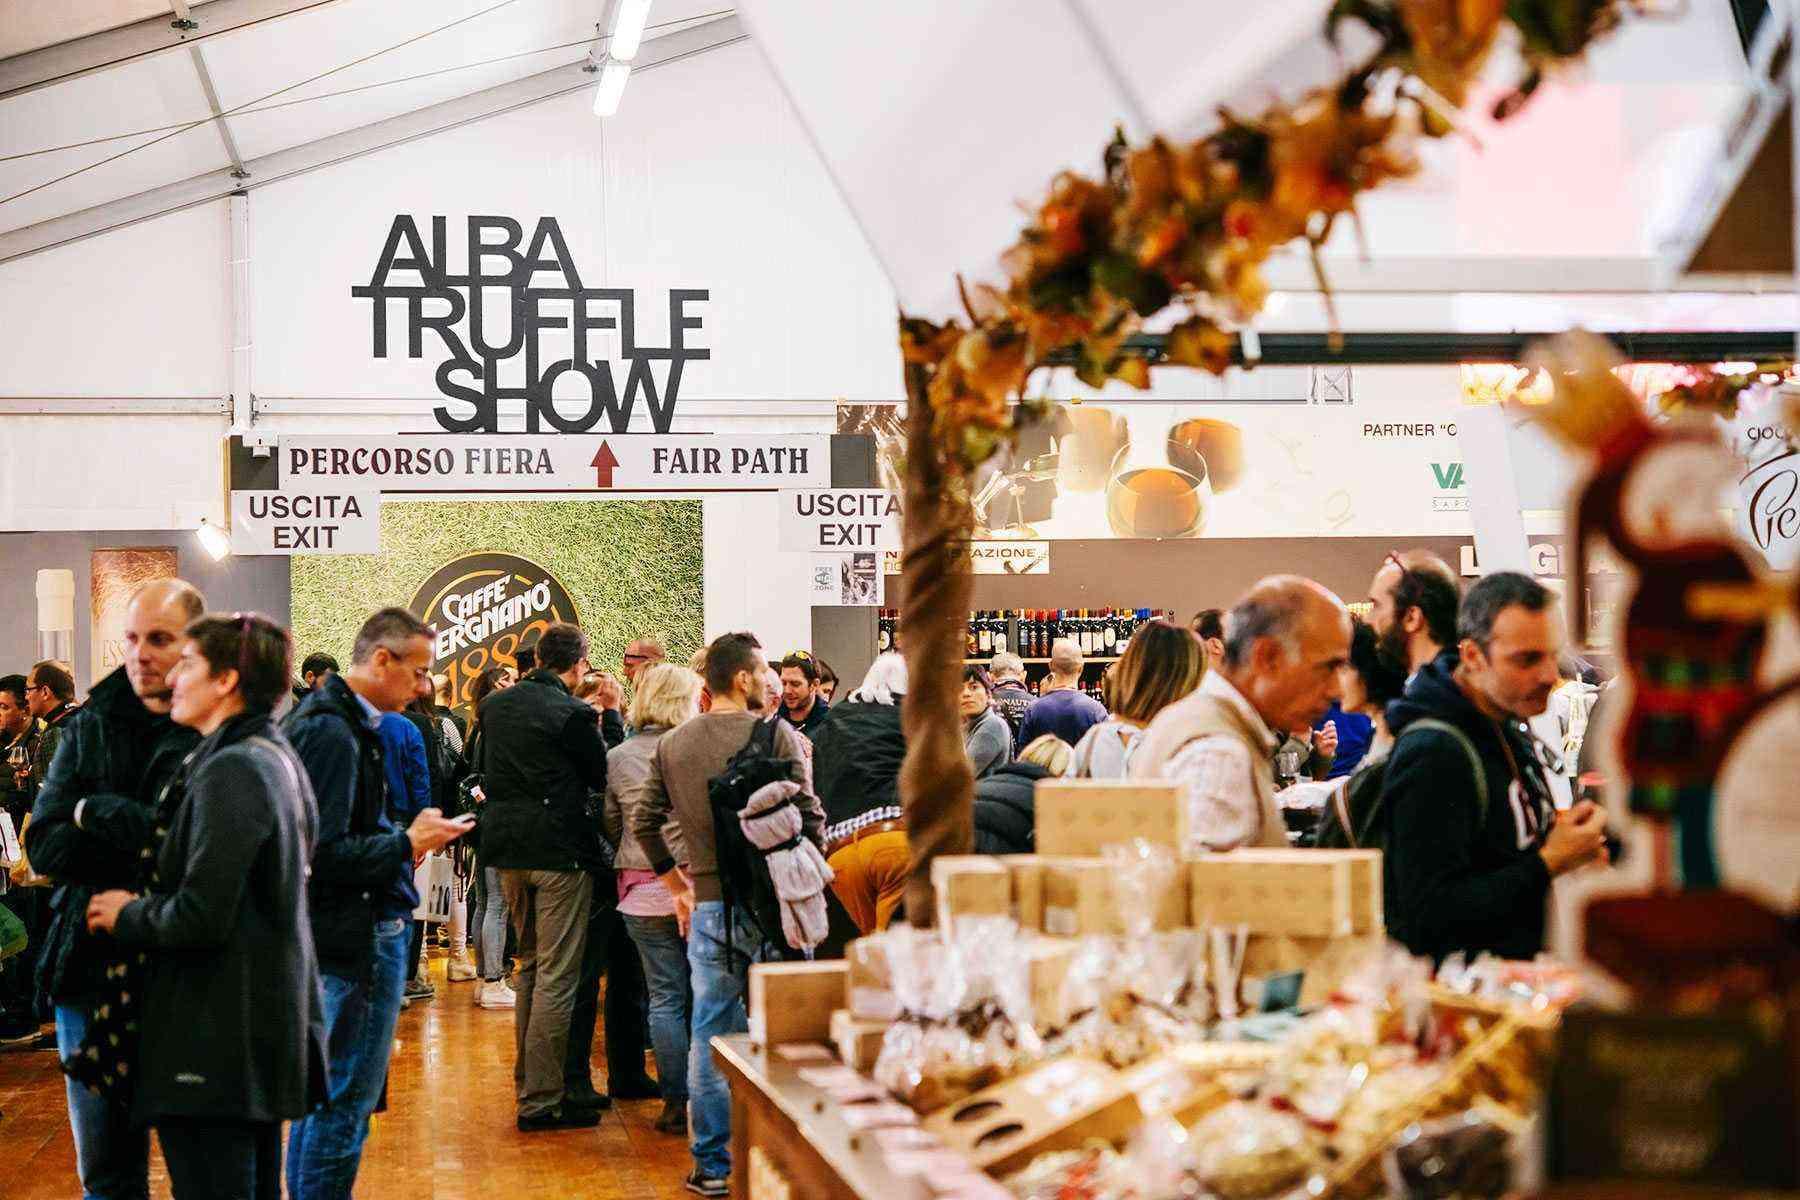 Fall-Food-Festivals-Alba-White-Truffle-Fair-1